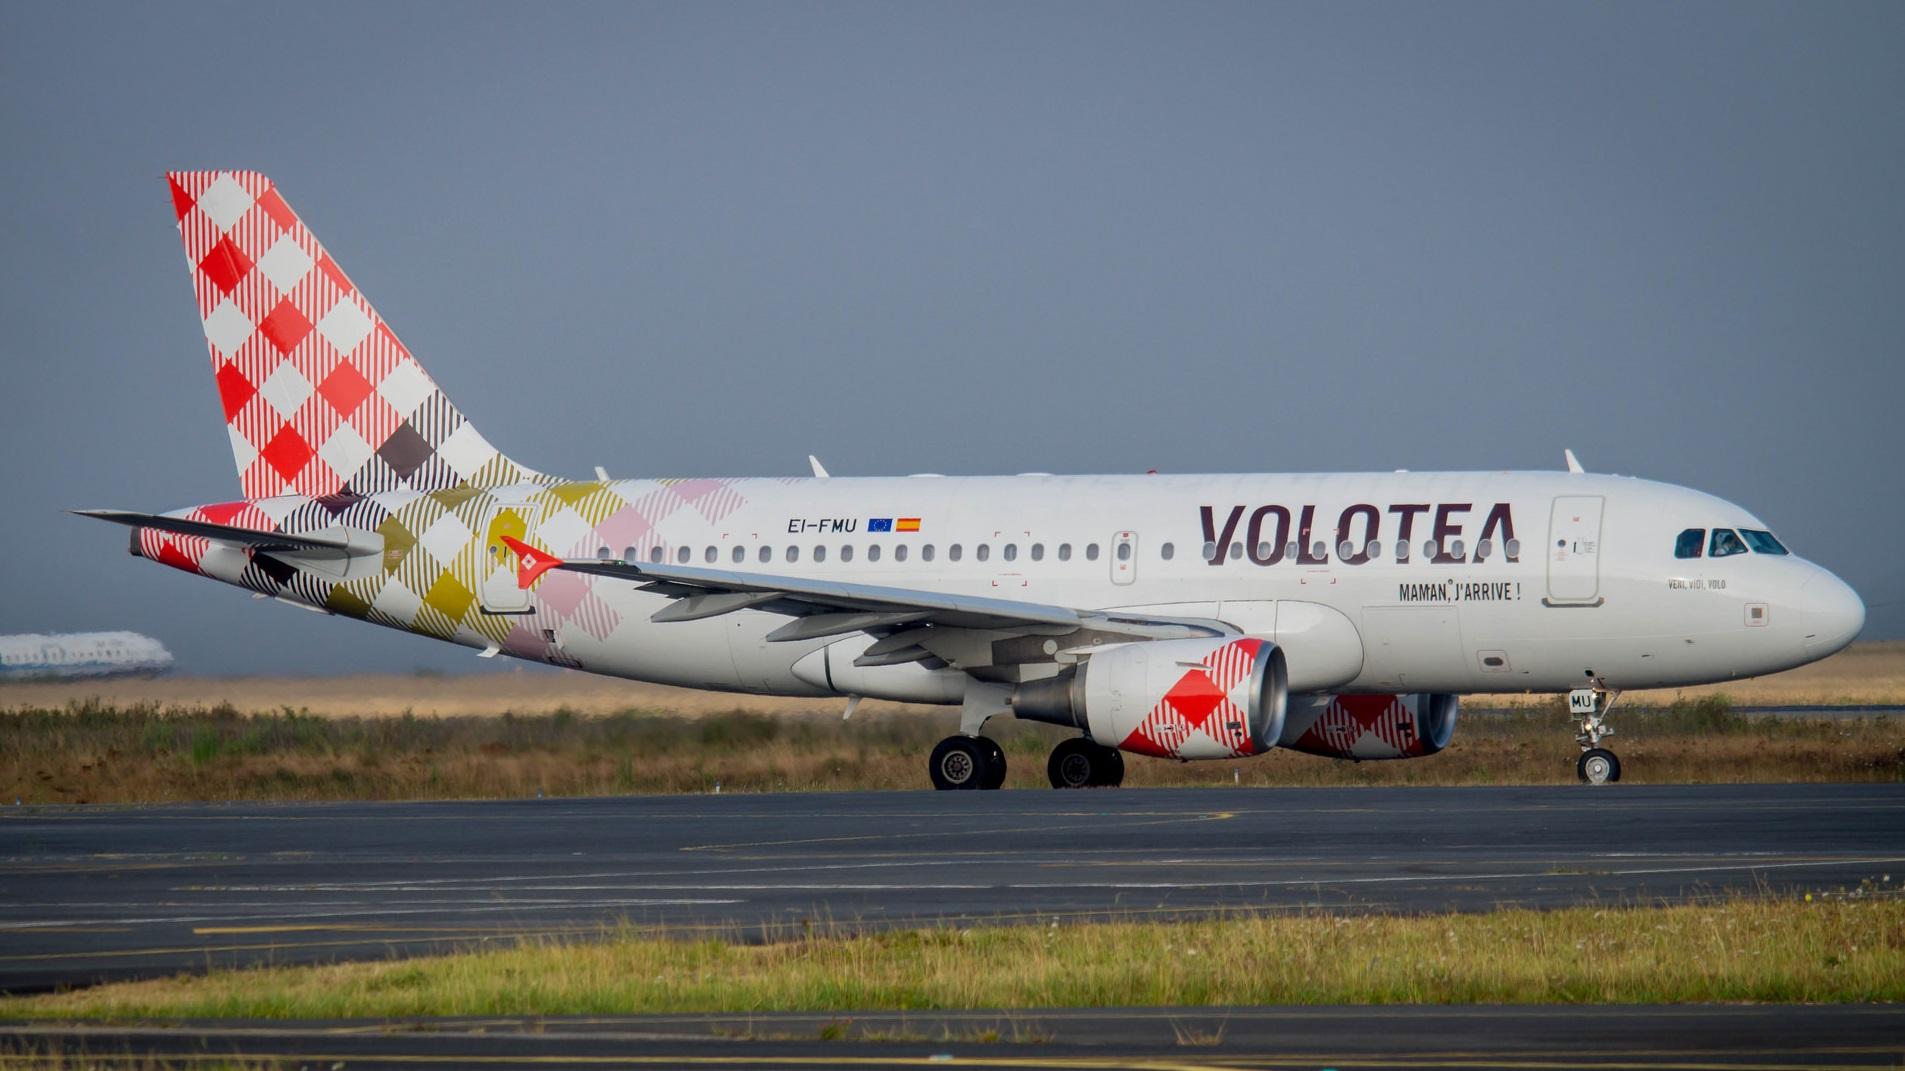 volotea-airline